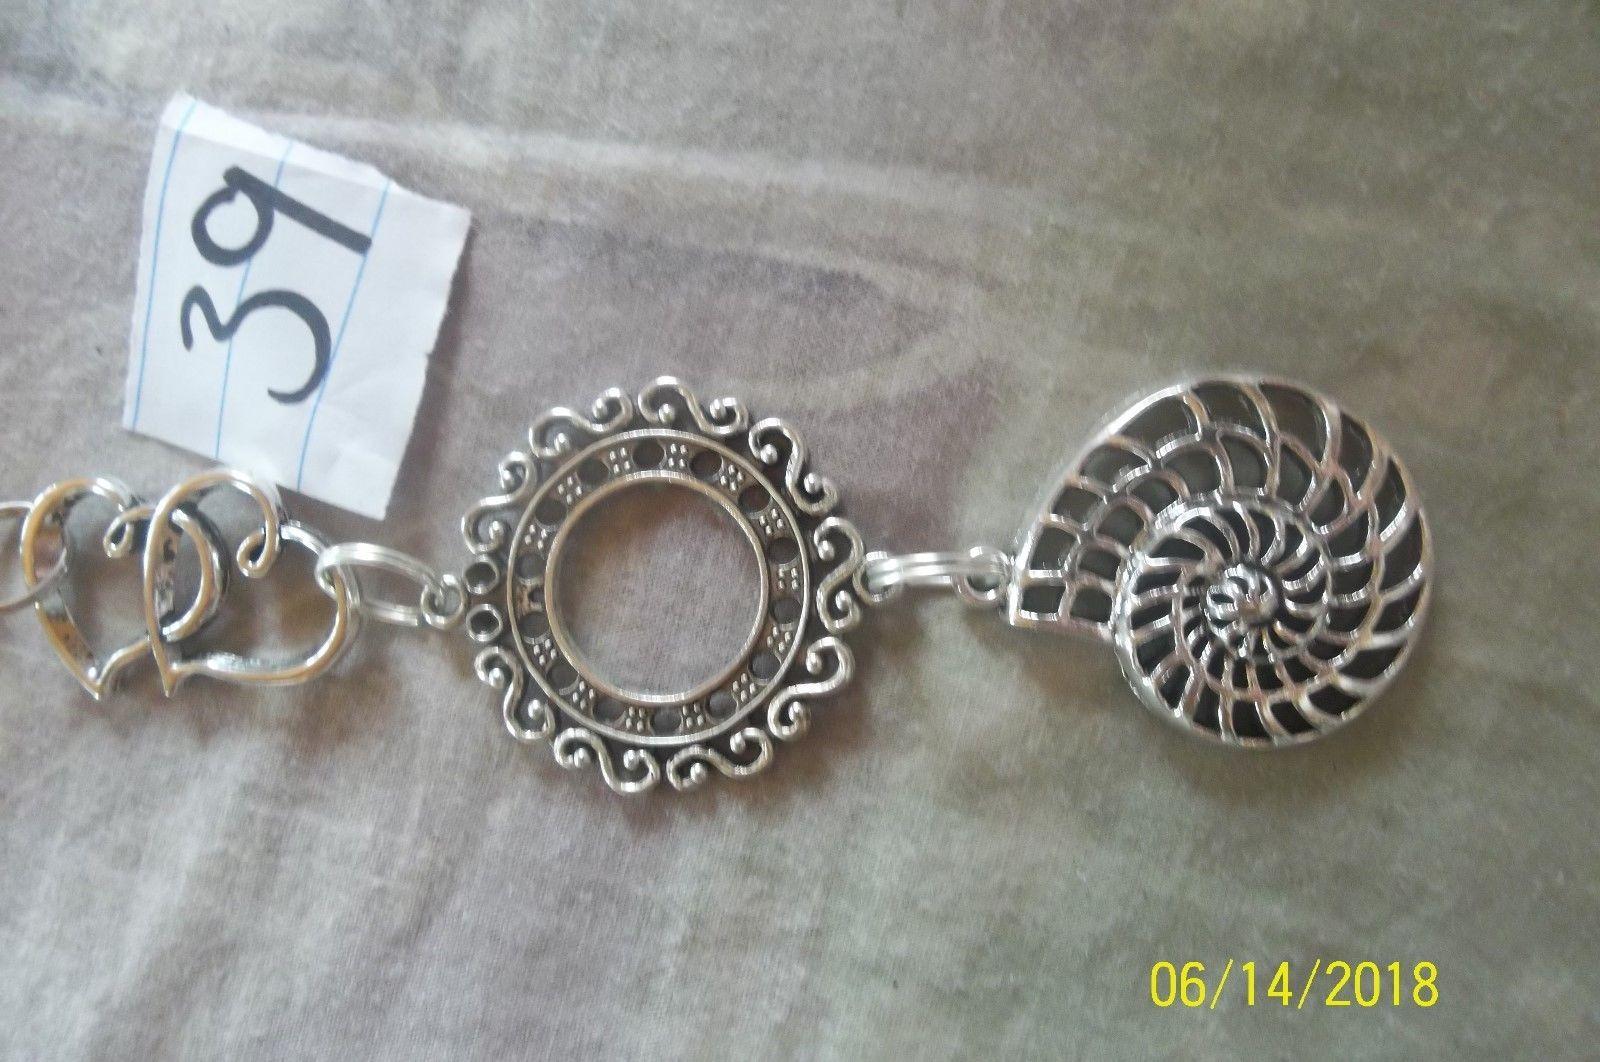 # purse jewelry silver color beauty keychain backpack filigree dangle charm #39